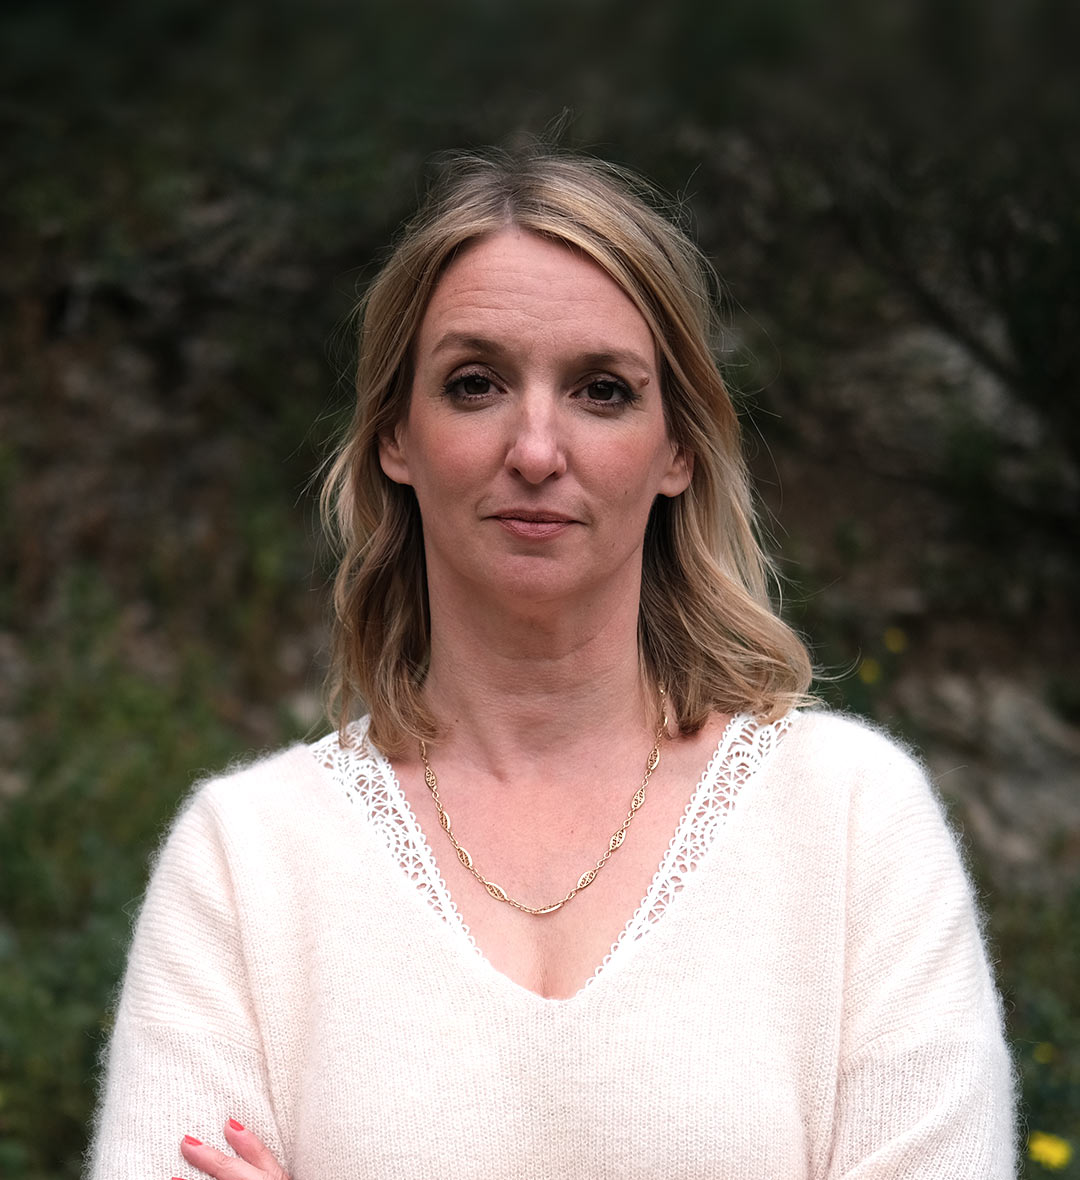 Julie Jourde